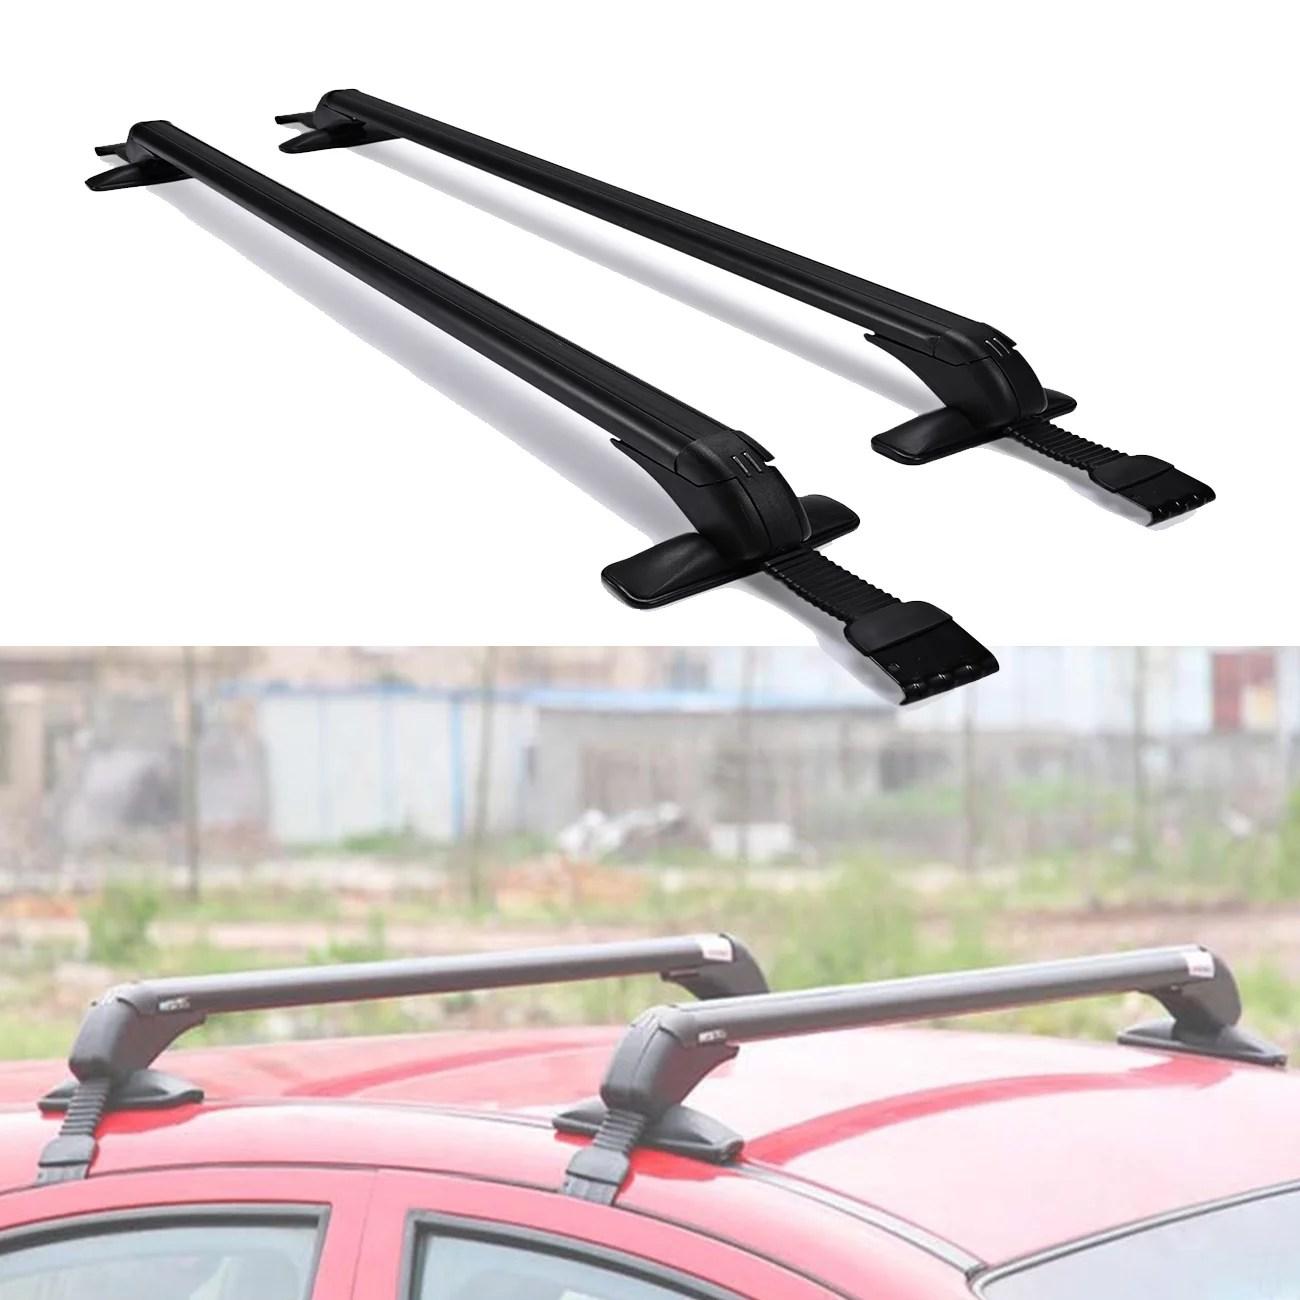 beamnova 39 universal roof rack crossbar adjustable black aluminum car roof cargo carrier luggage rack top basket mountings